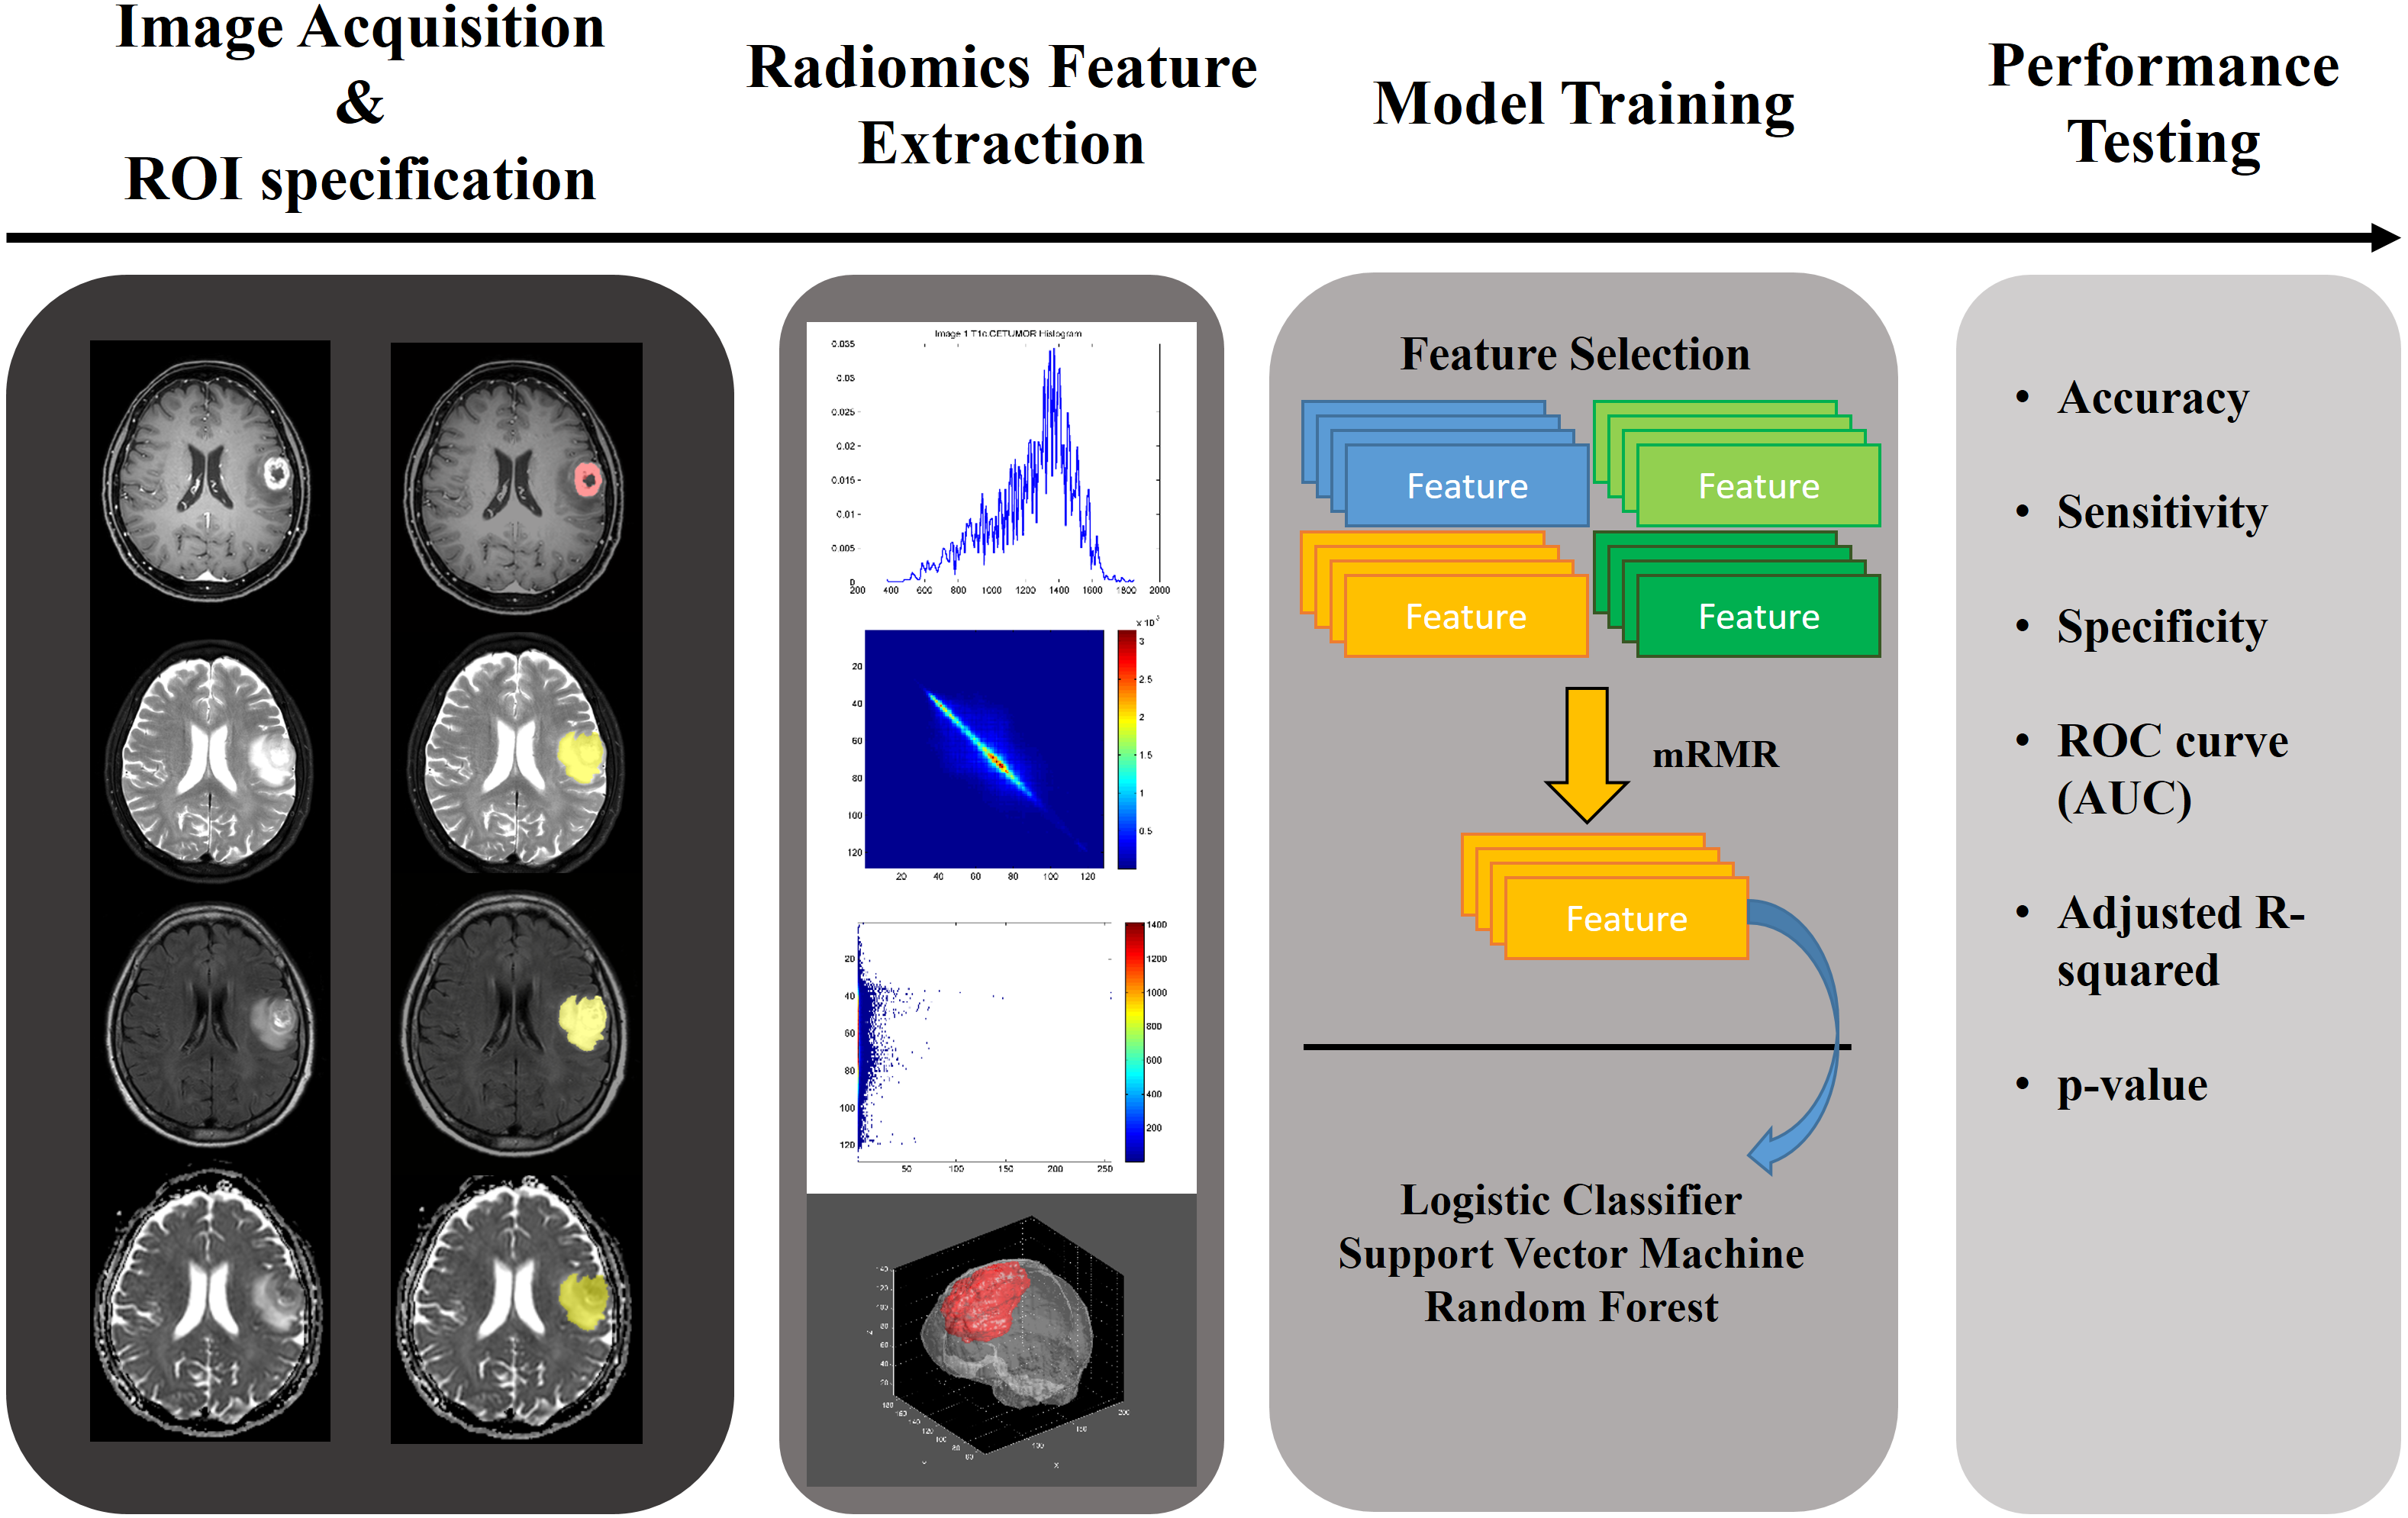 Classification of the glioma grading using radiomics analysis [PeerJ]